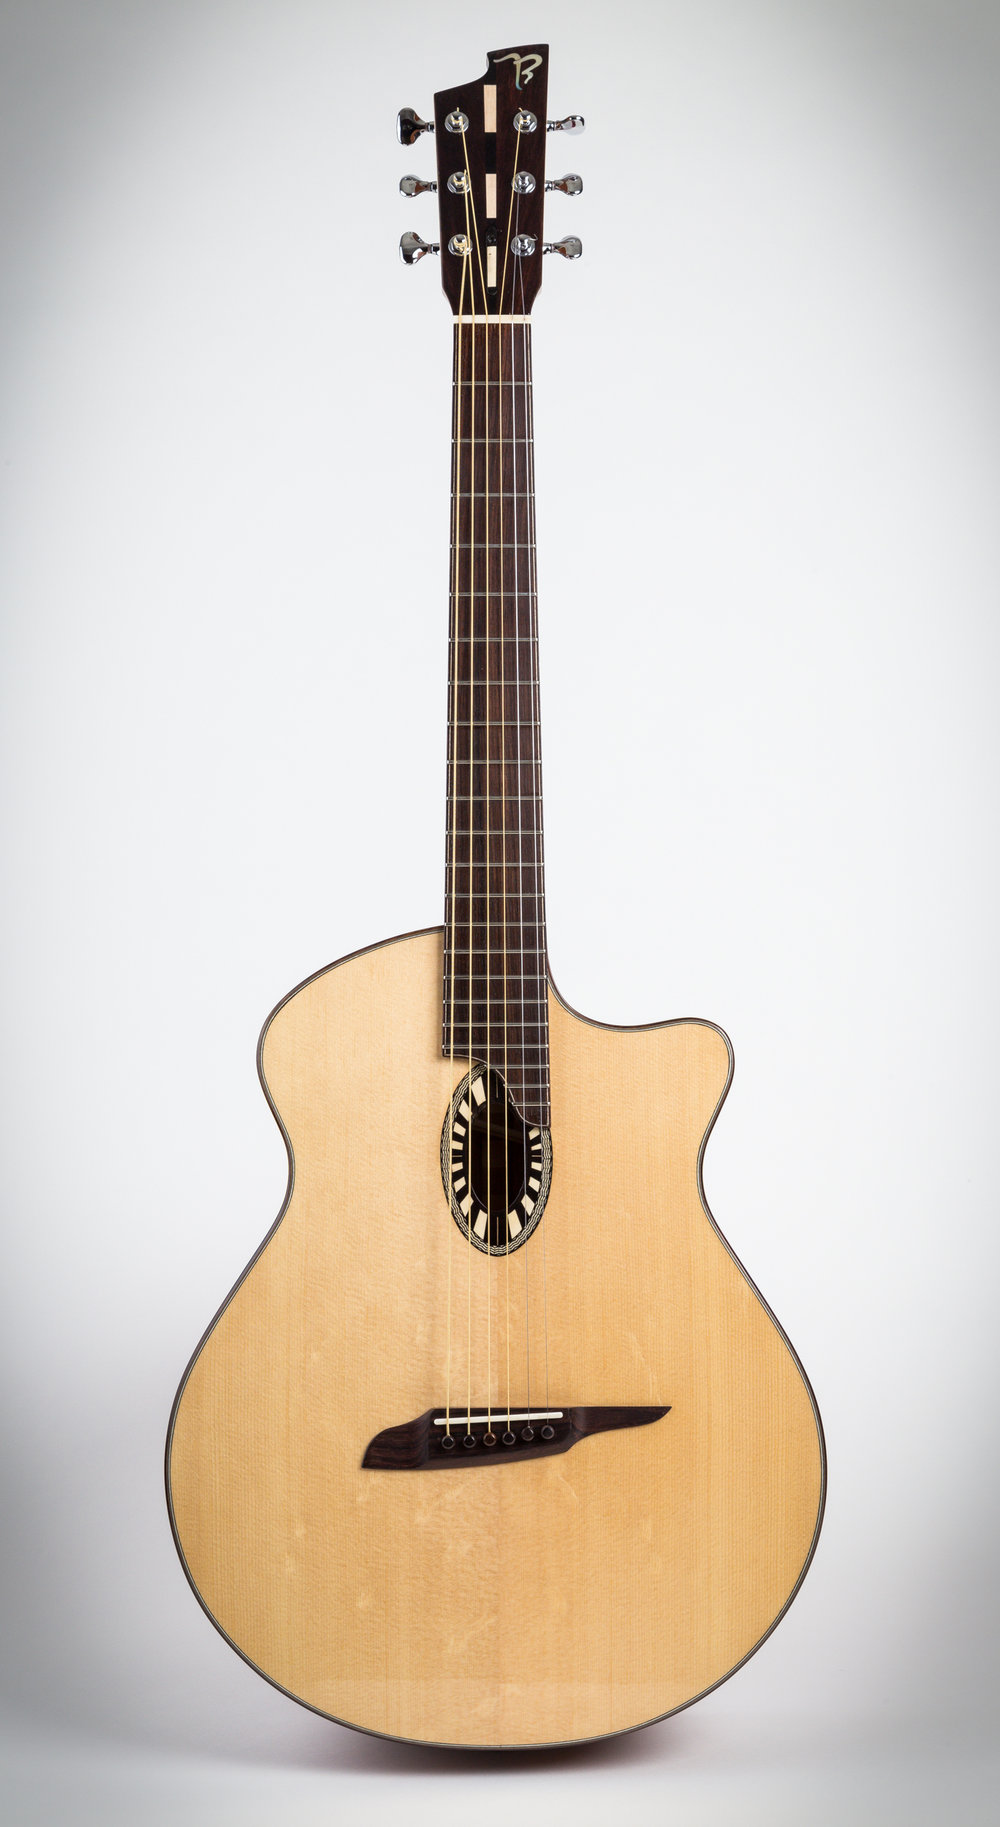 Model 2 - 15.25